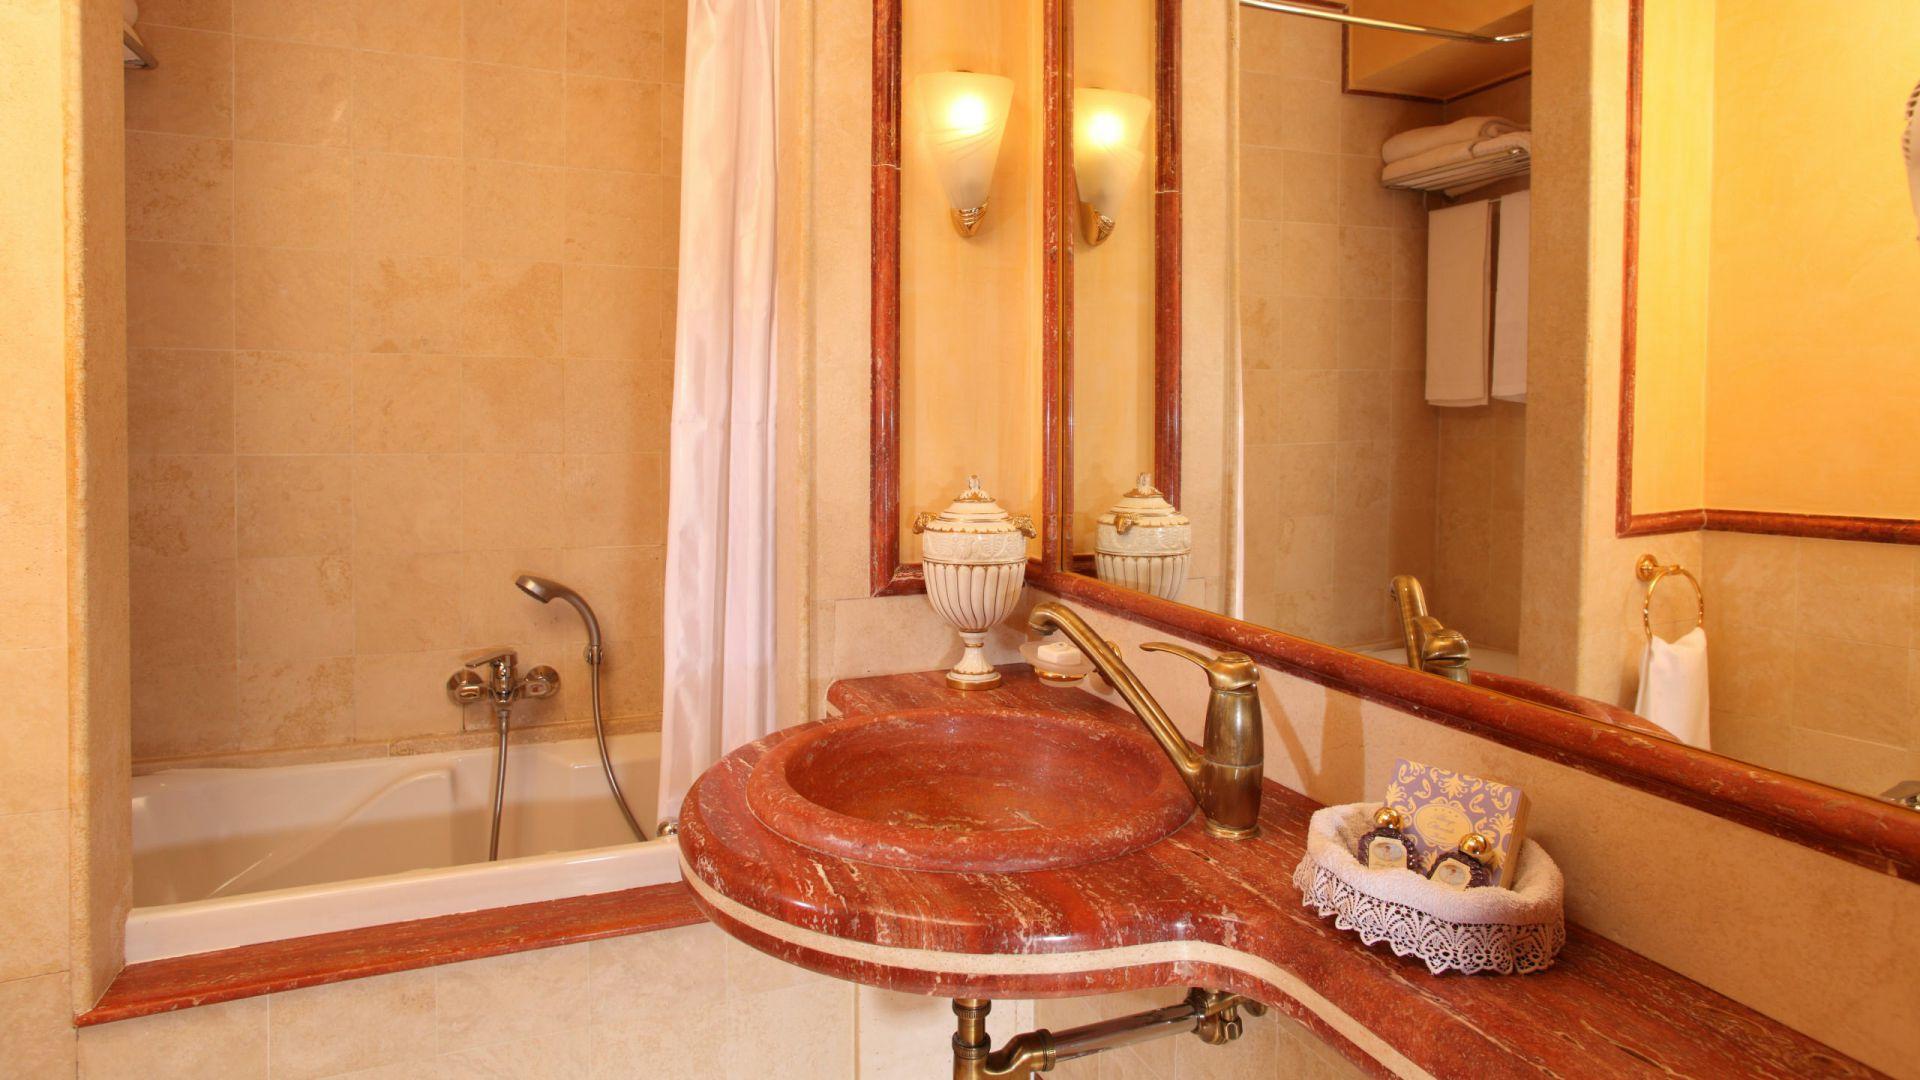 albergo-ottocento-rome-salle-de-bain-19